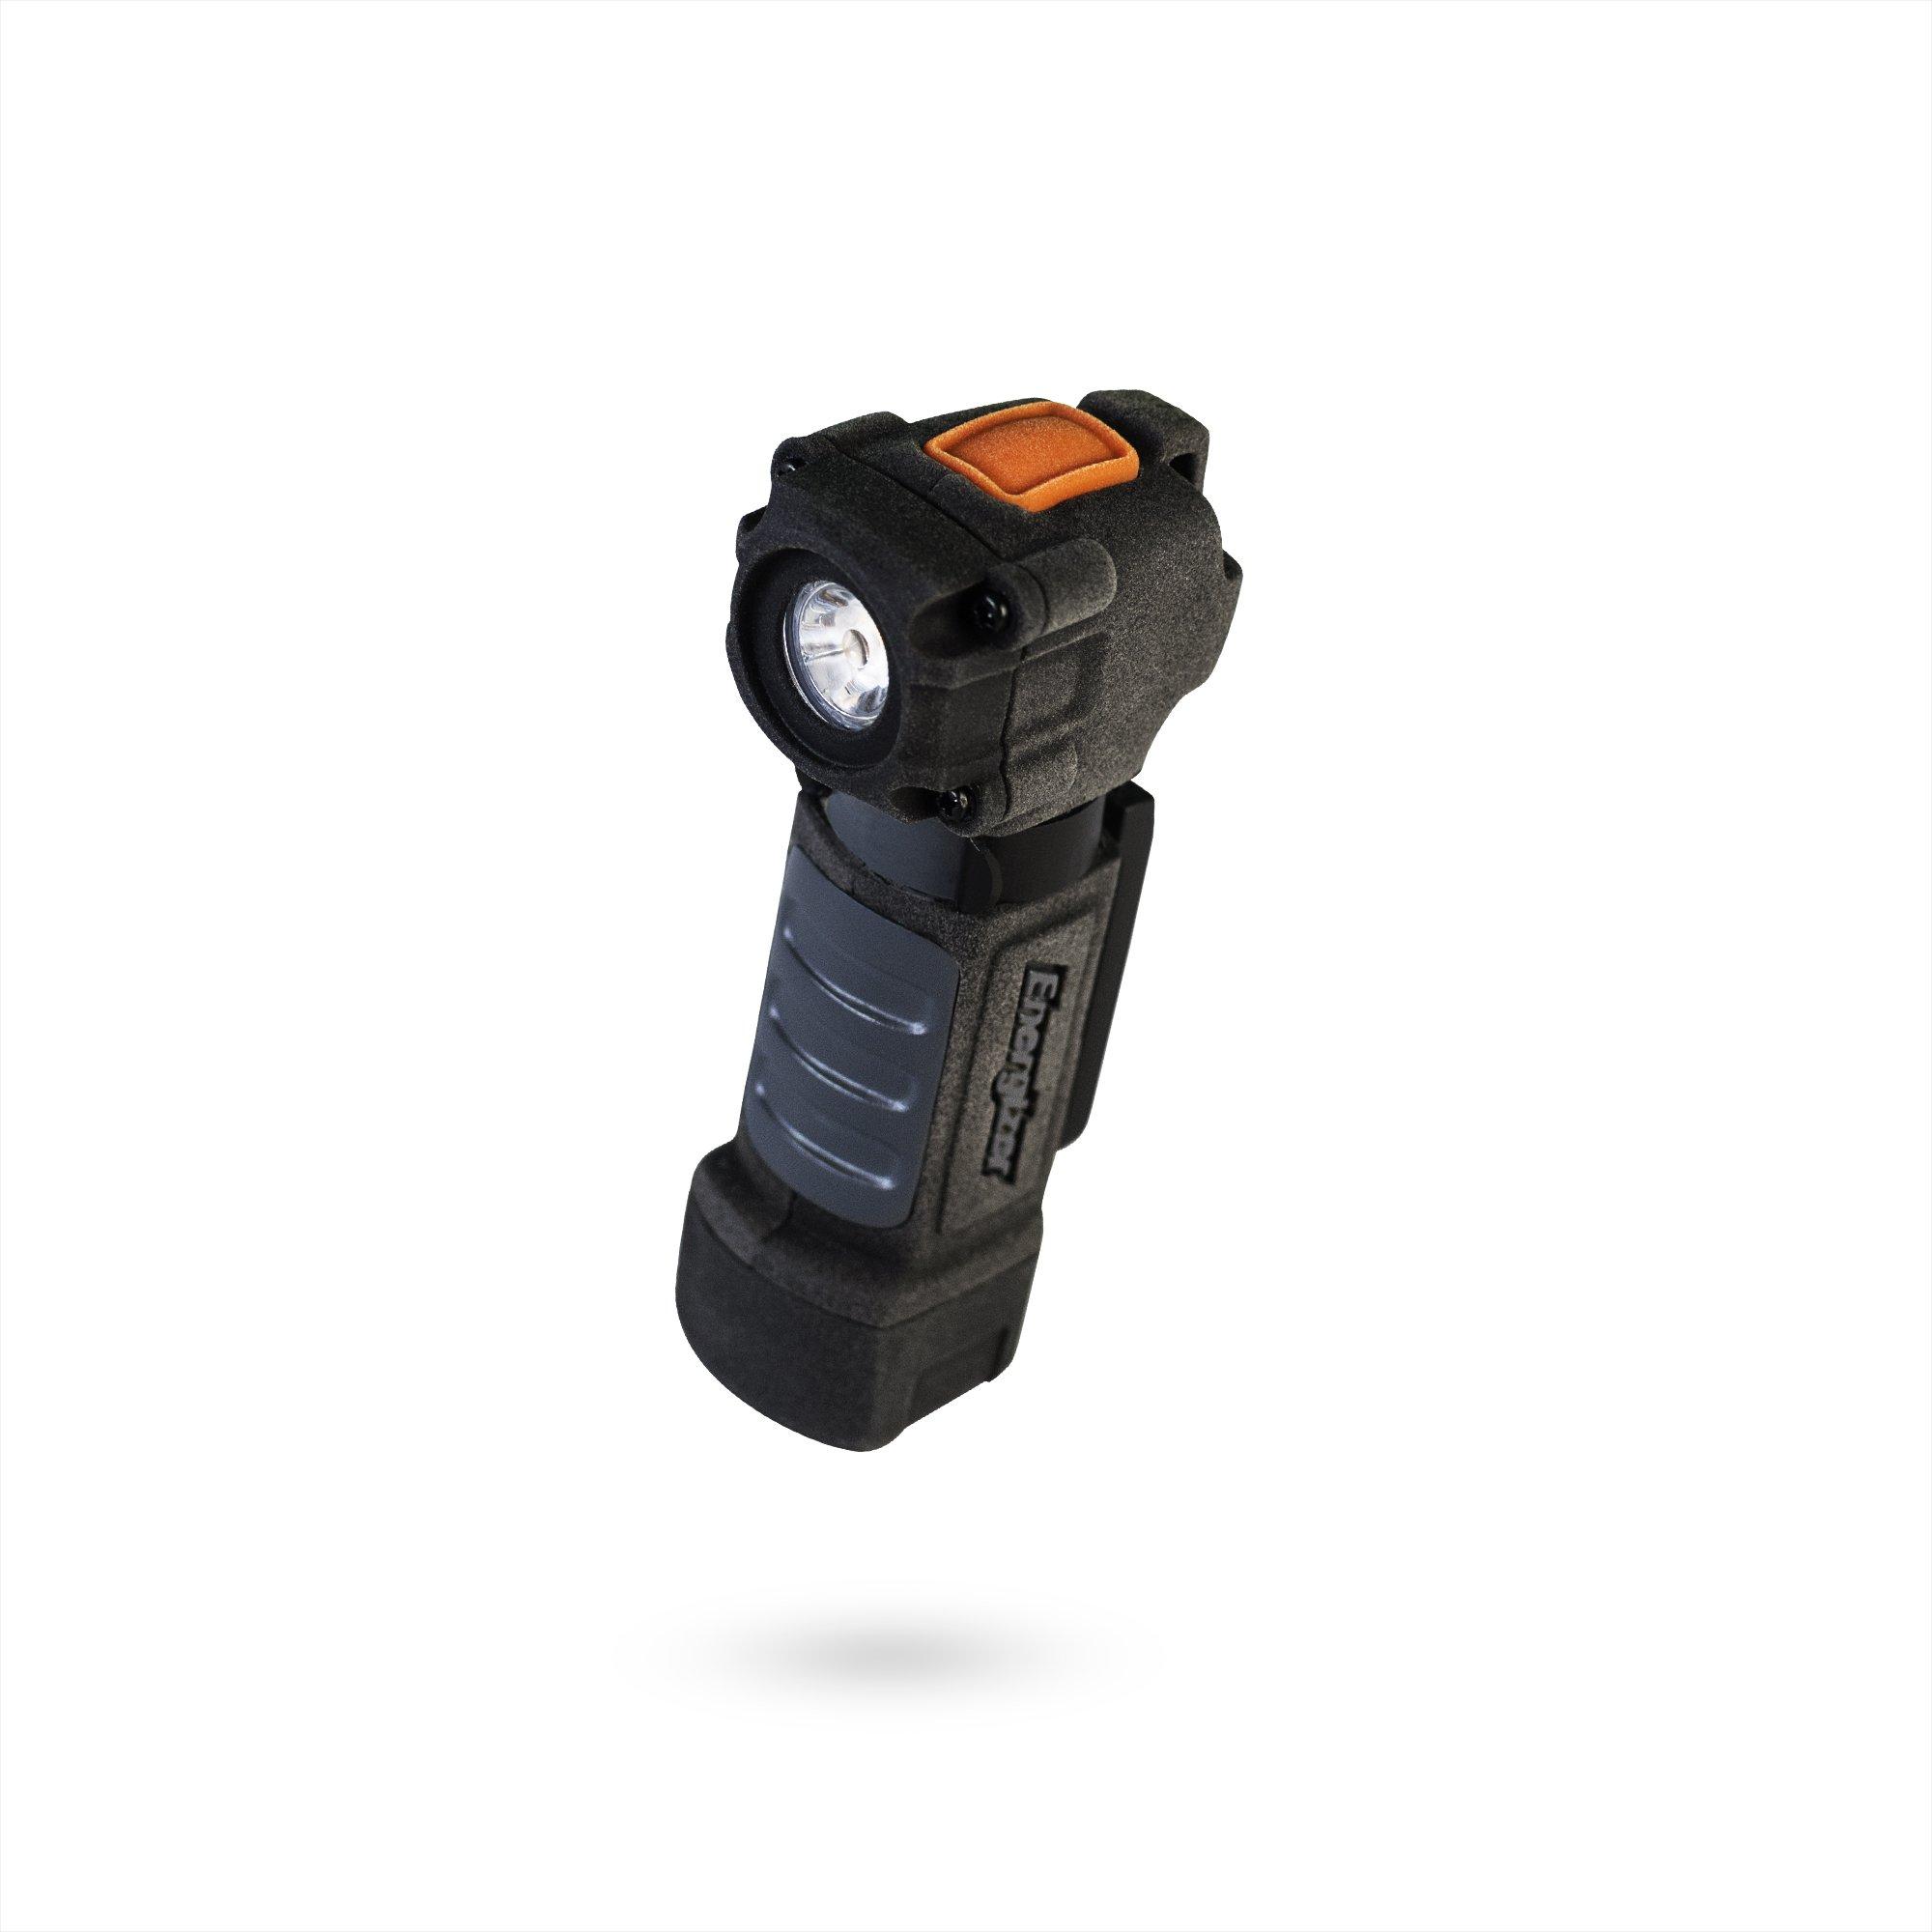 Energizer LED AA Magnetic Flashlight, Multi-Use Hard Case Light, 75 Lumens (Batteries Included) by Energizer Lighting